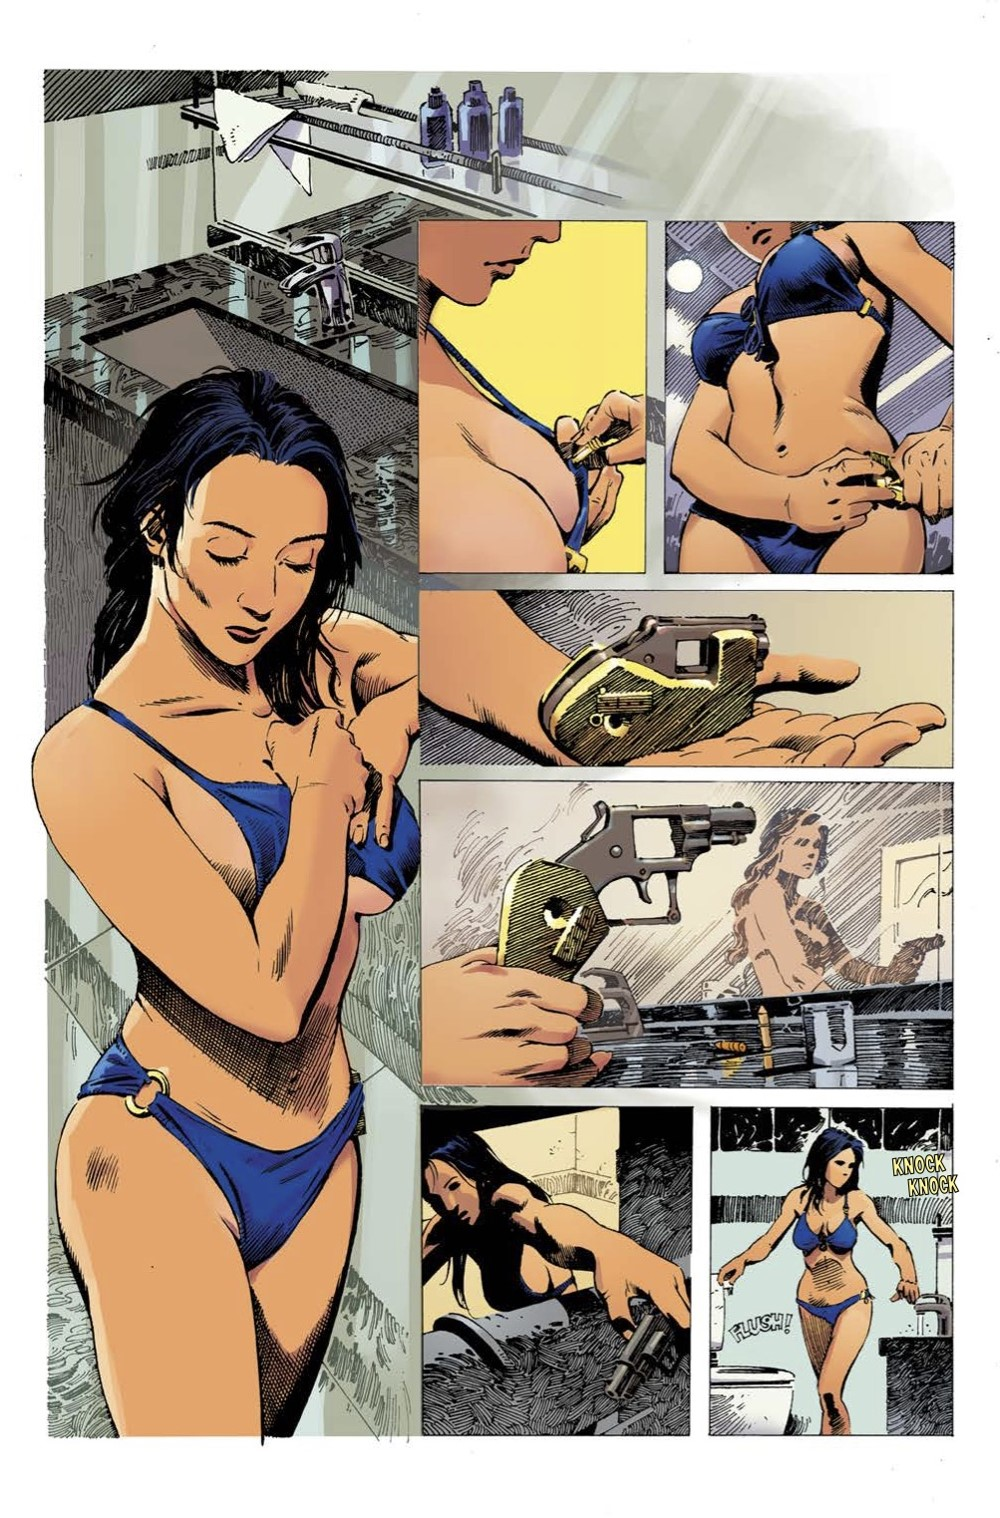 2 ComicList Previews: GUN HONEY #1